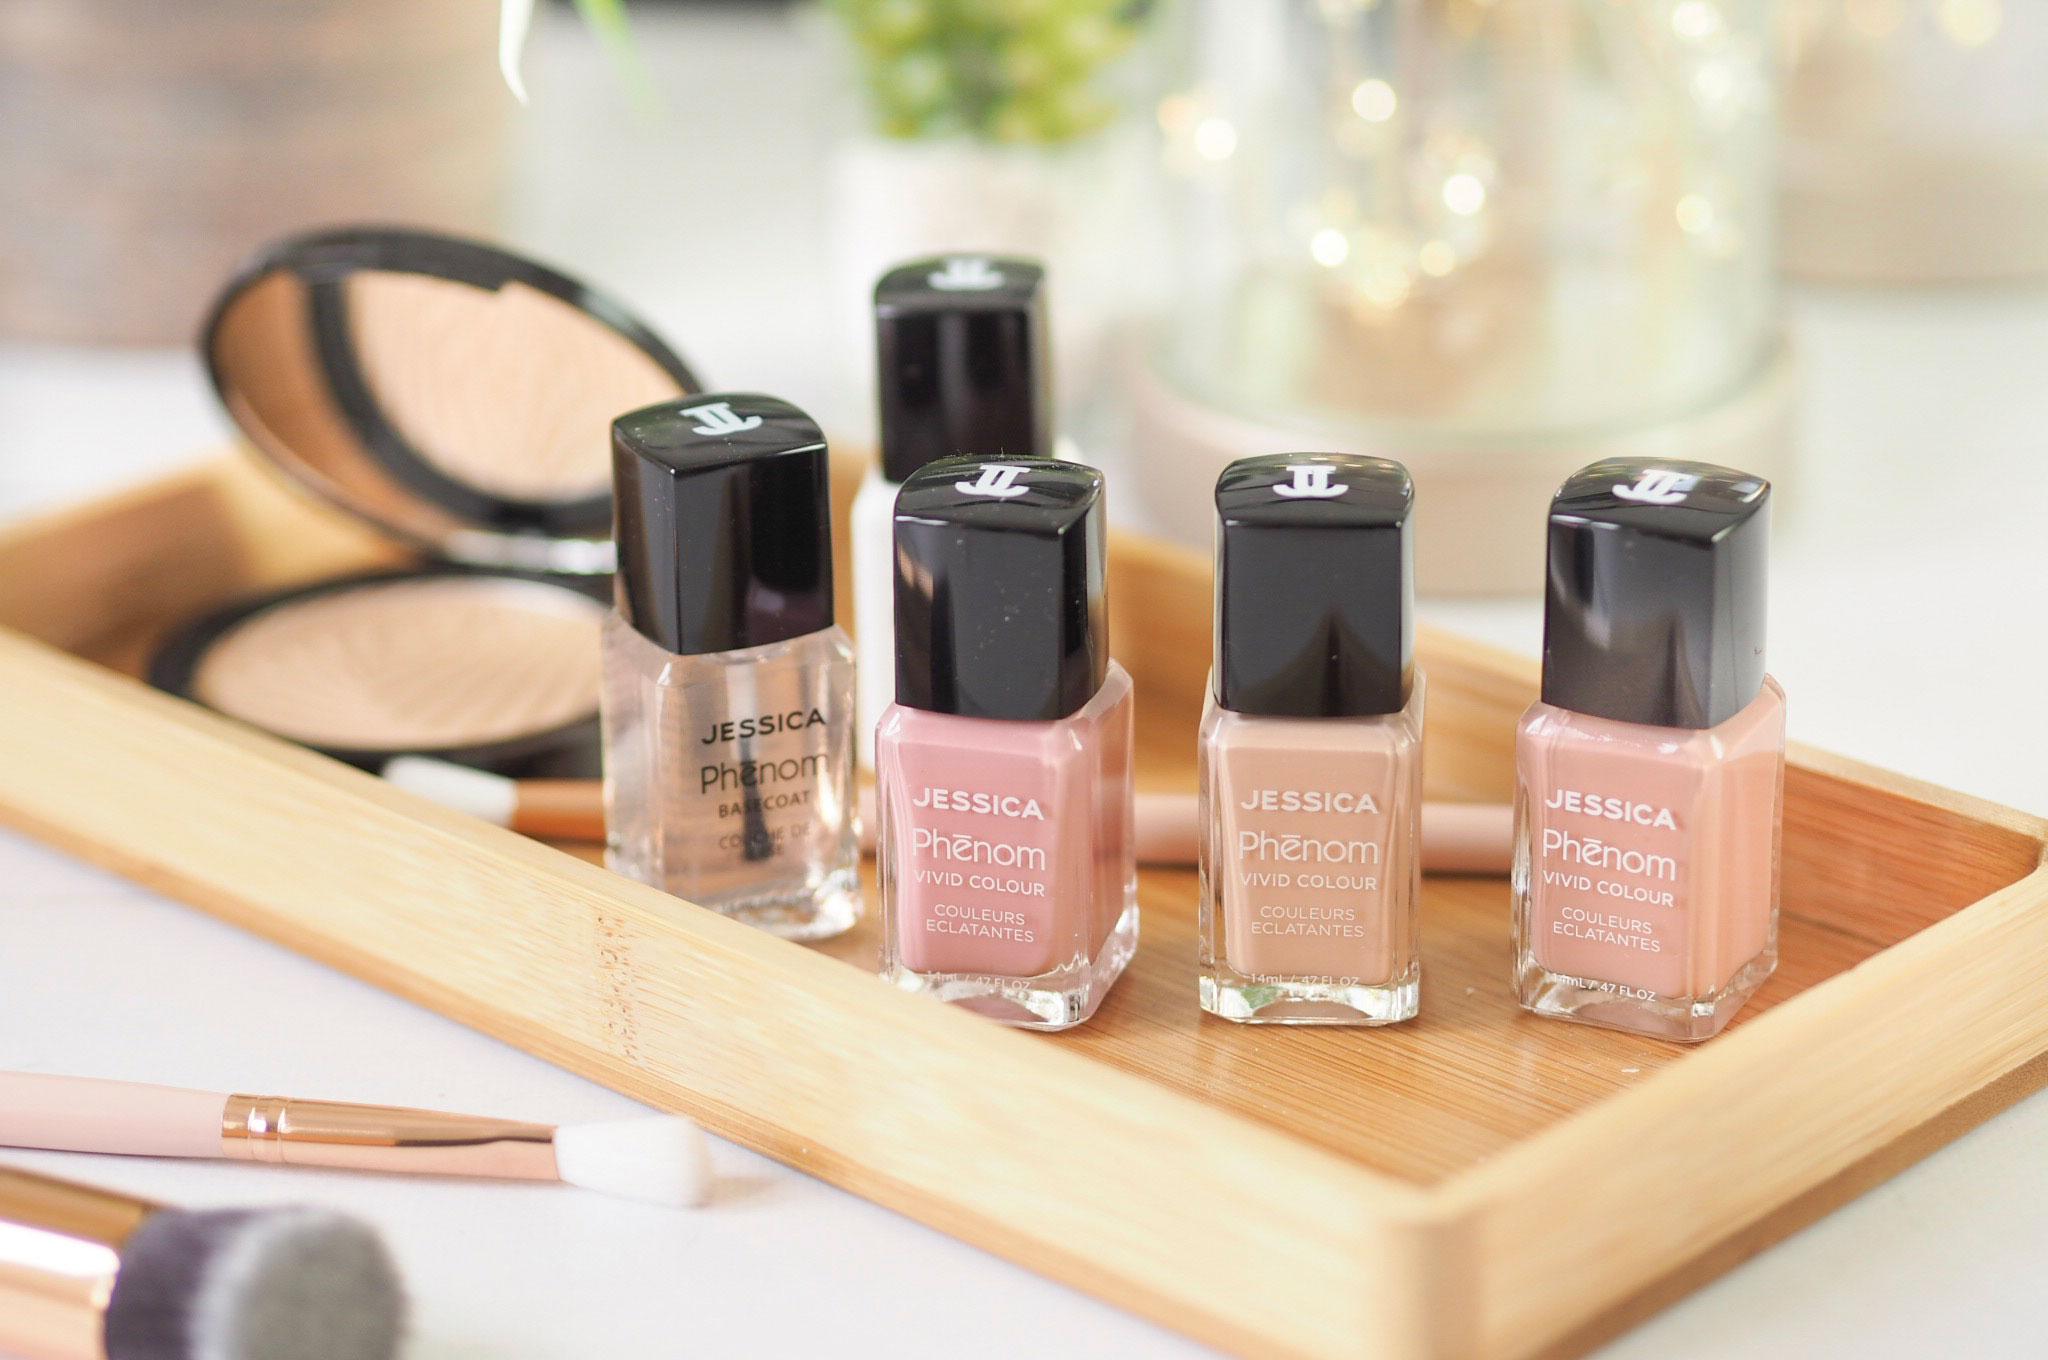 Jessica Phenom Blushing Beauty Nail Polishes